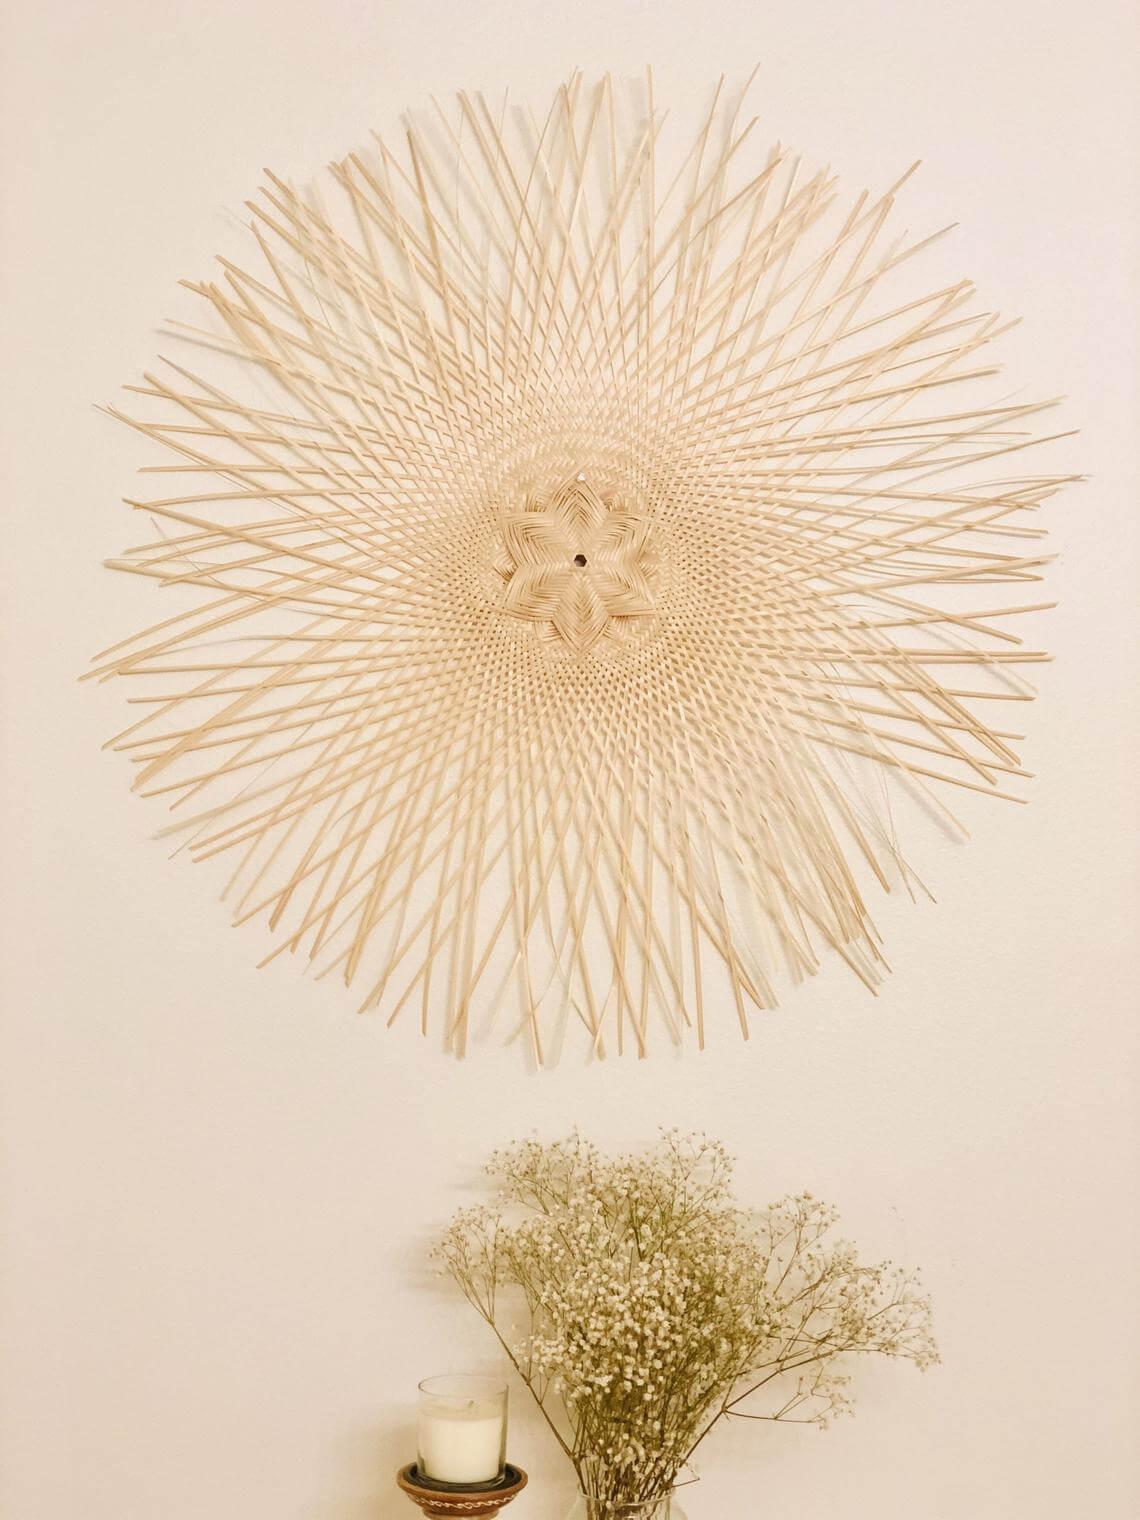 Spectacular Sunburst from Woven Bamboo